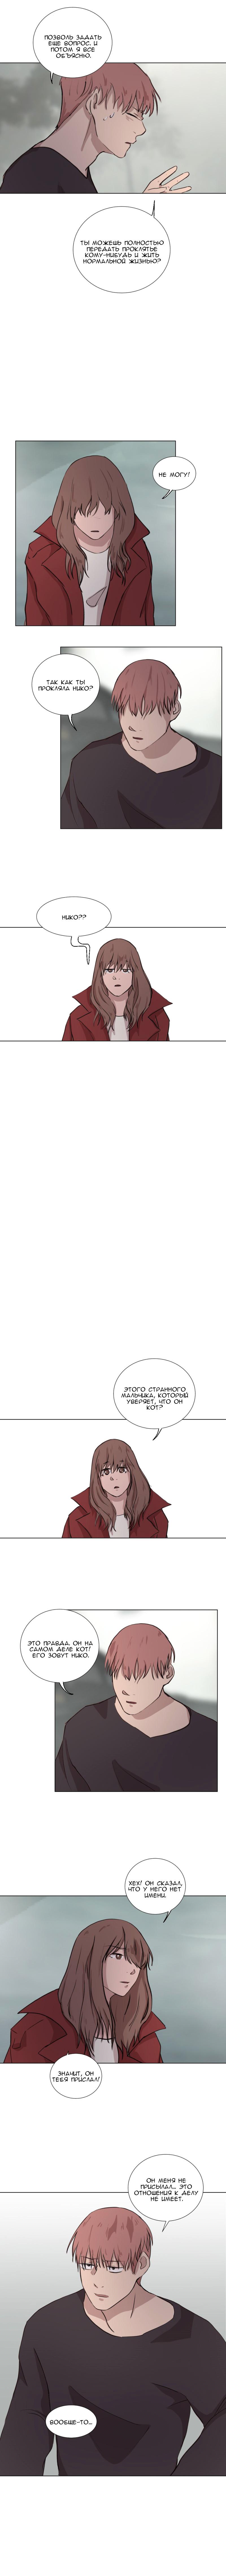 https://r1.ninemanga.com/comics/pic2/58/31802/416848/1533716850941.jpg Page 8